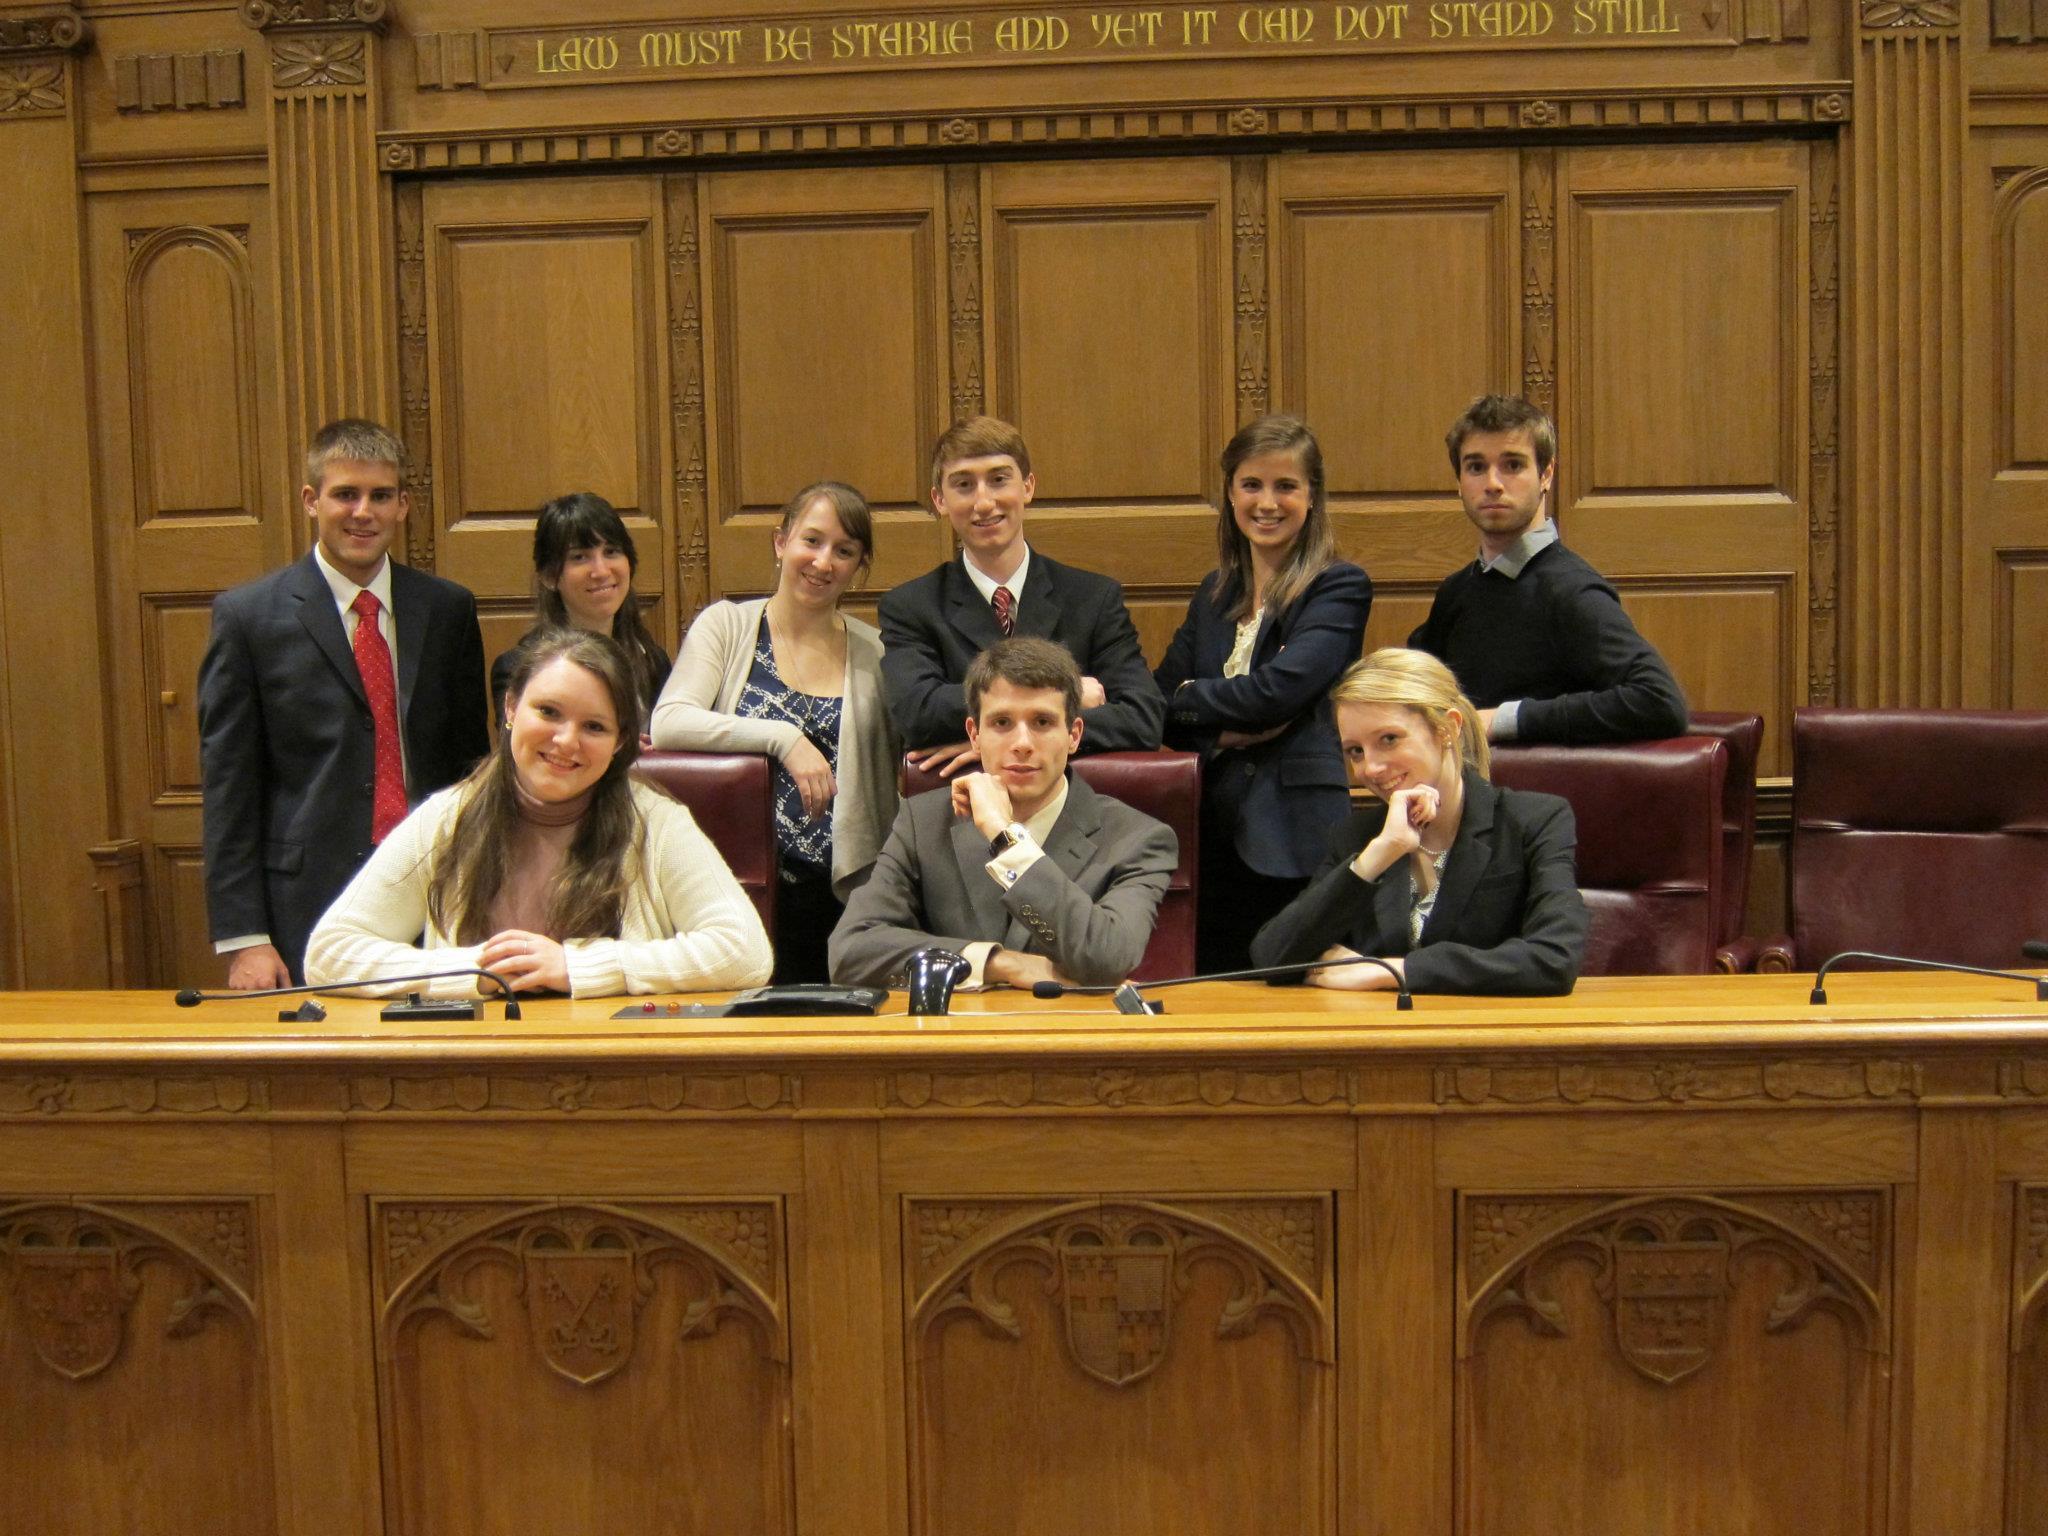 Ian Carradine Advances in Mock Trial as a College Freshman